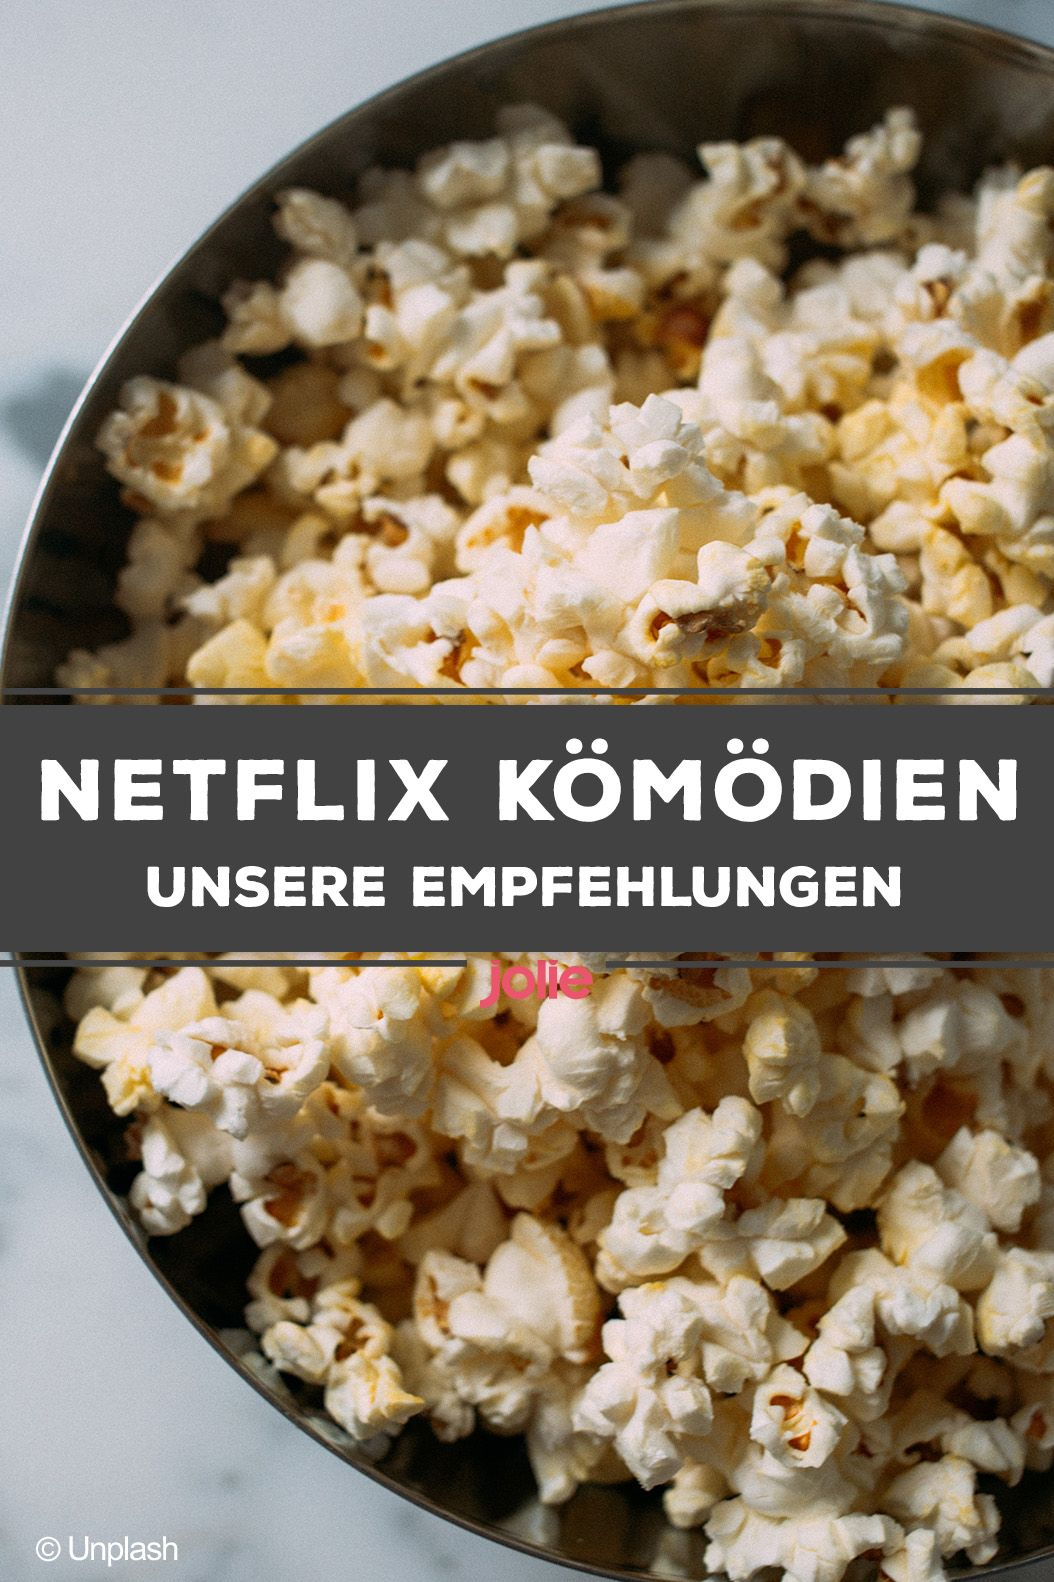 Gute Komödien Netflix